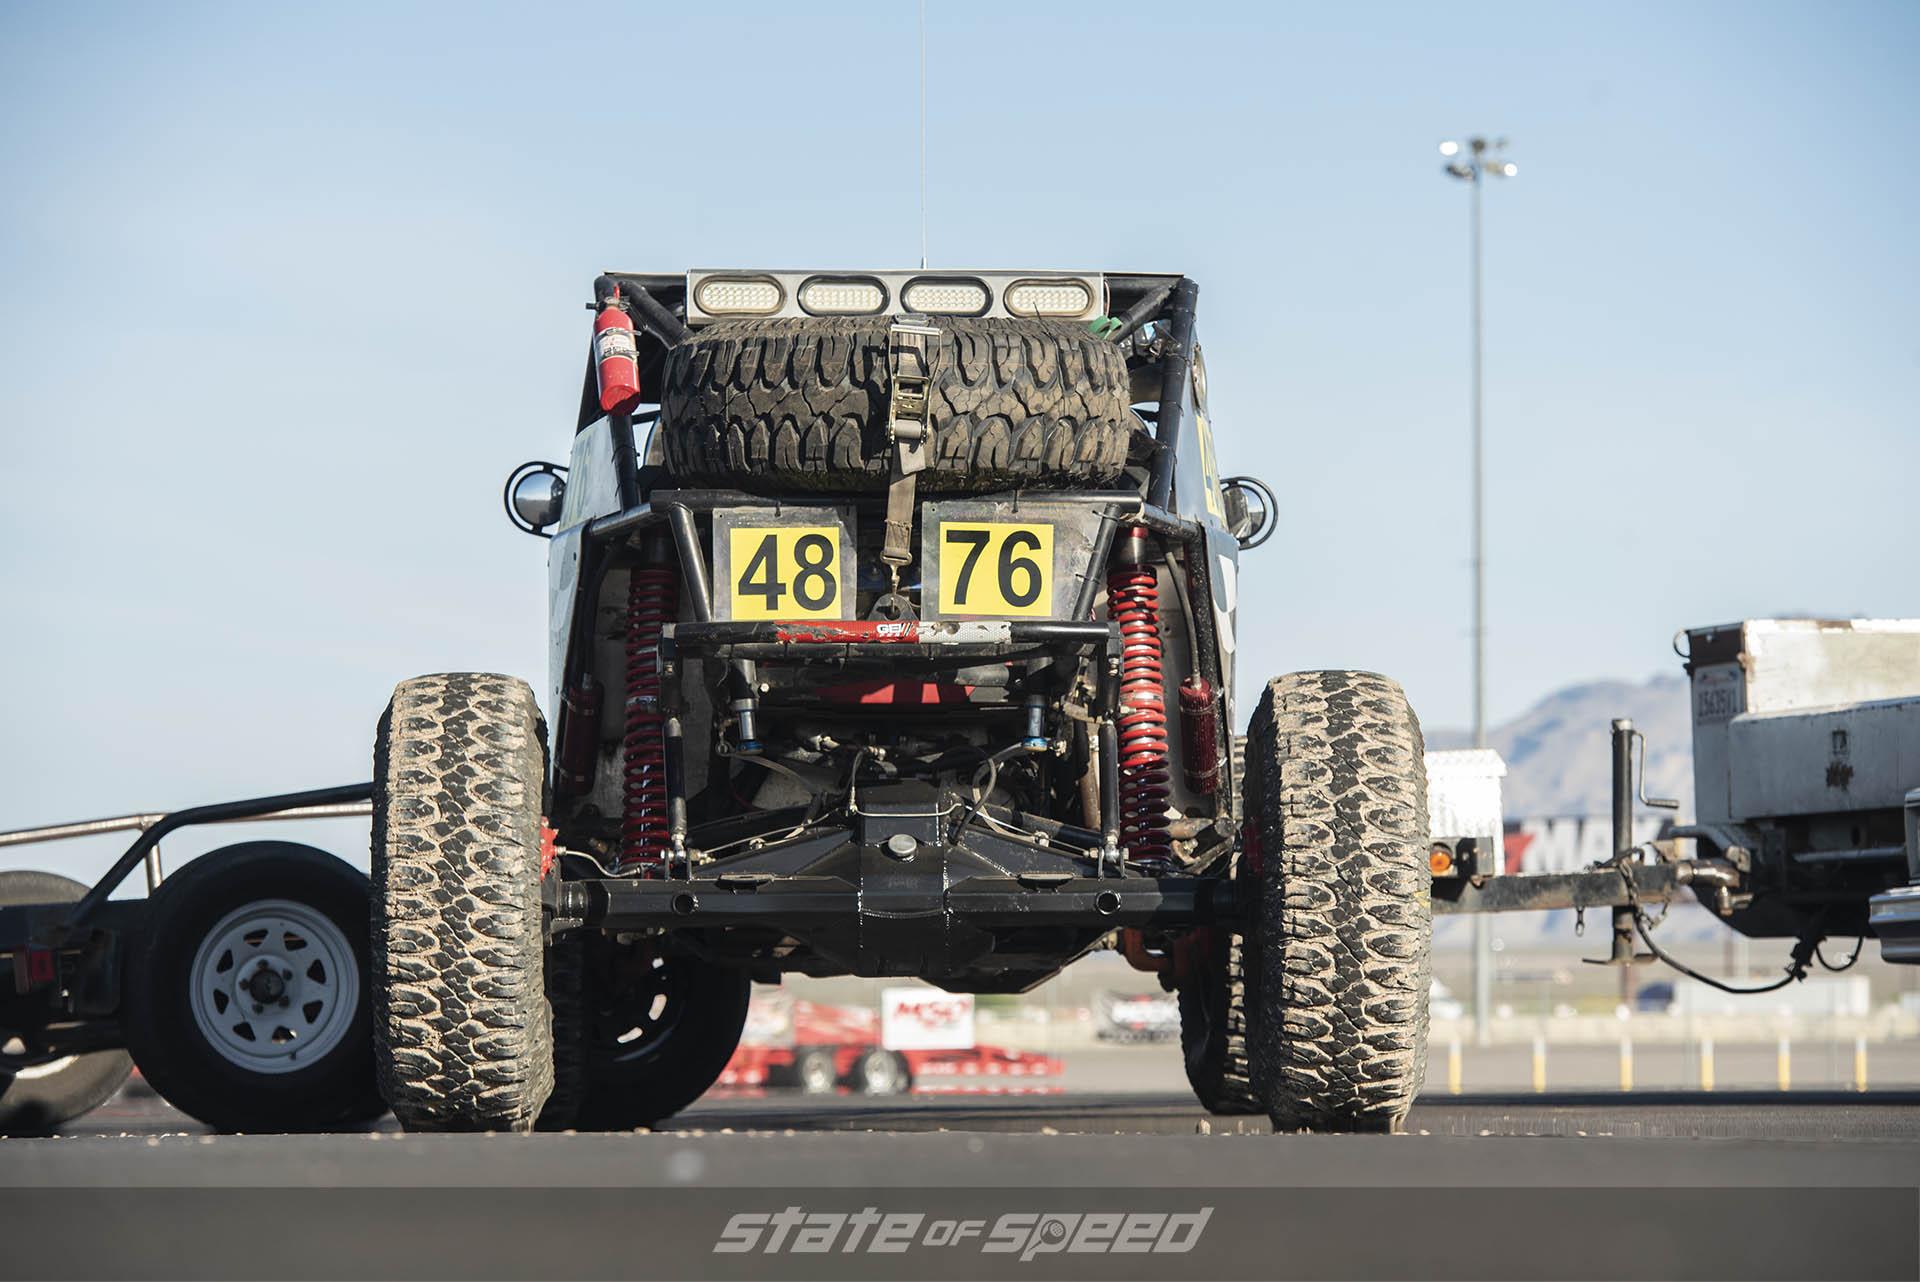 Offload race car axle